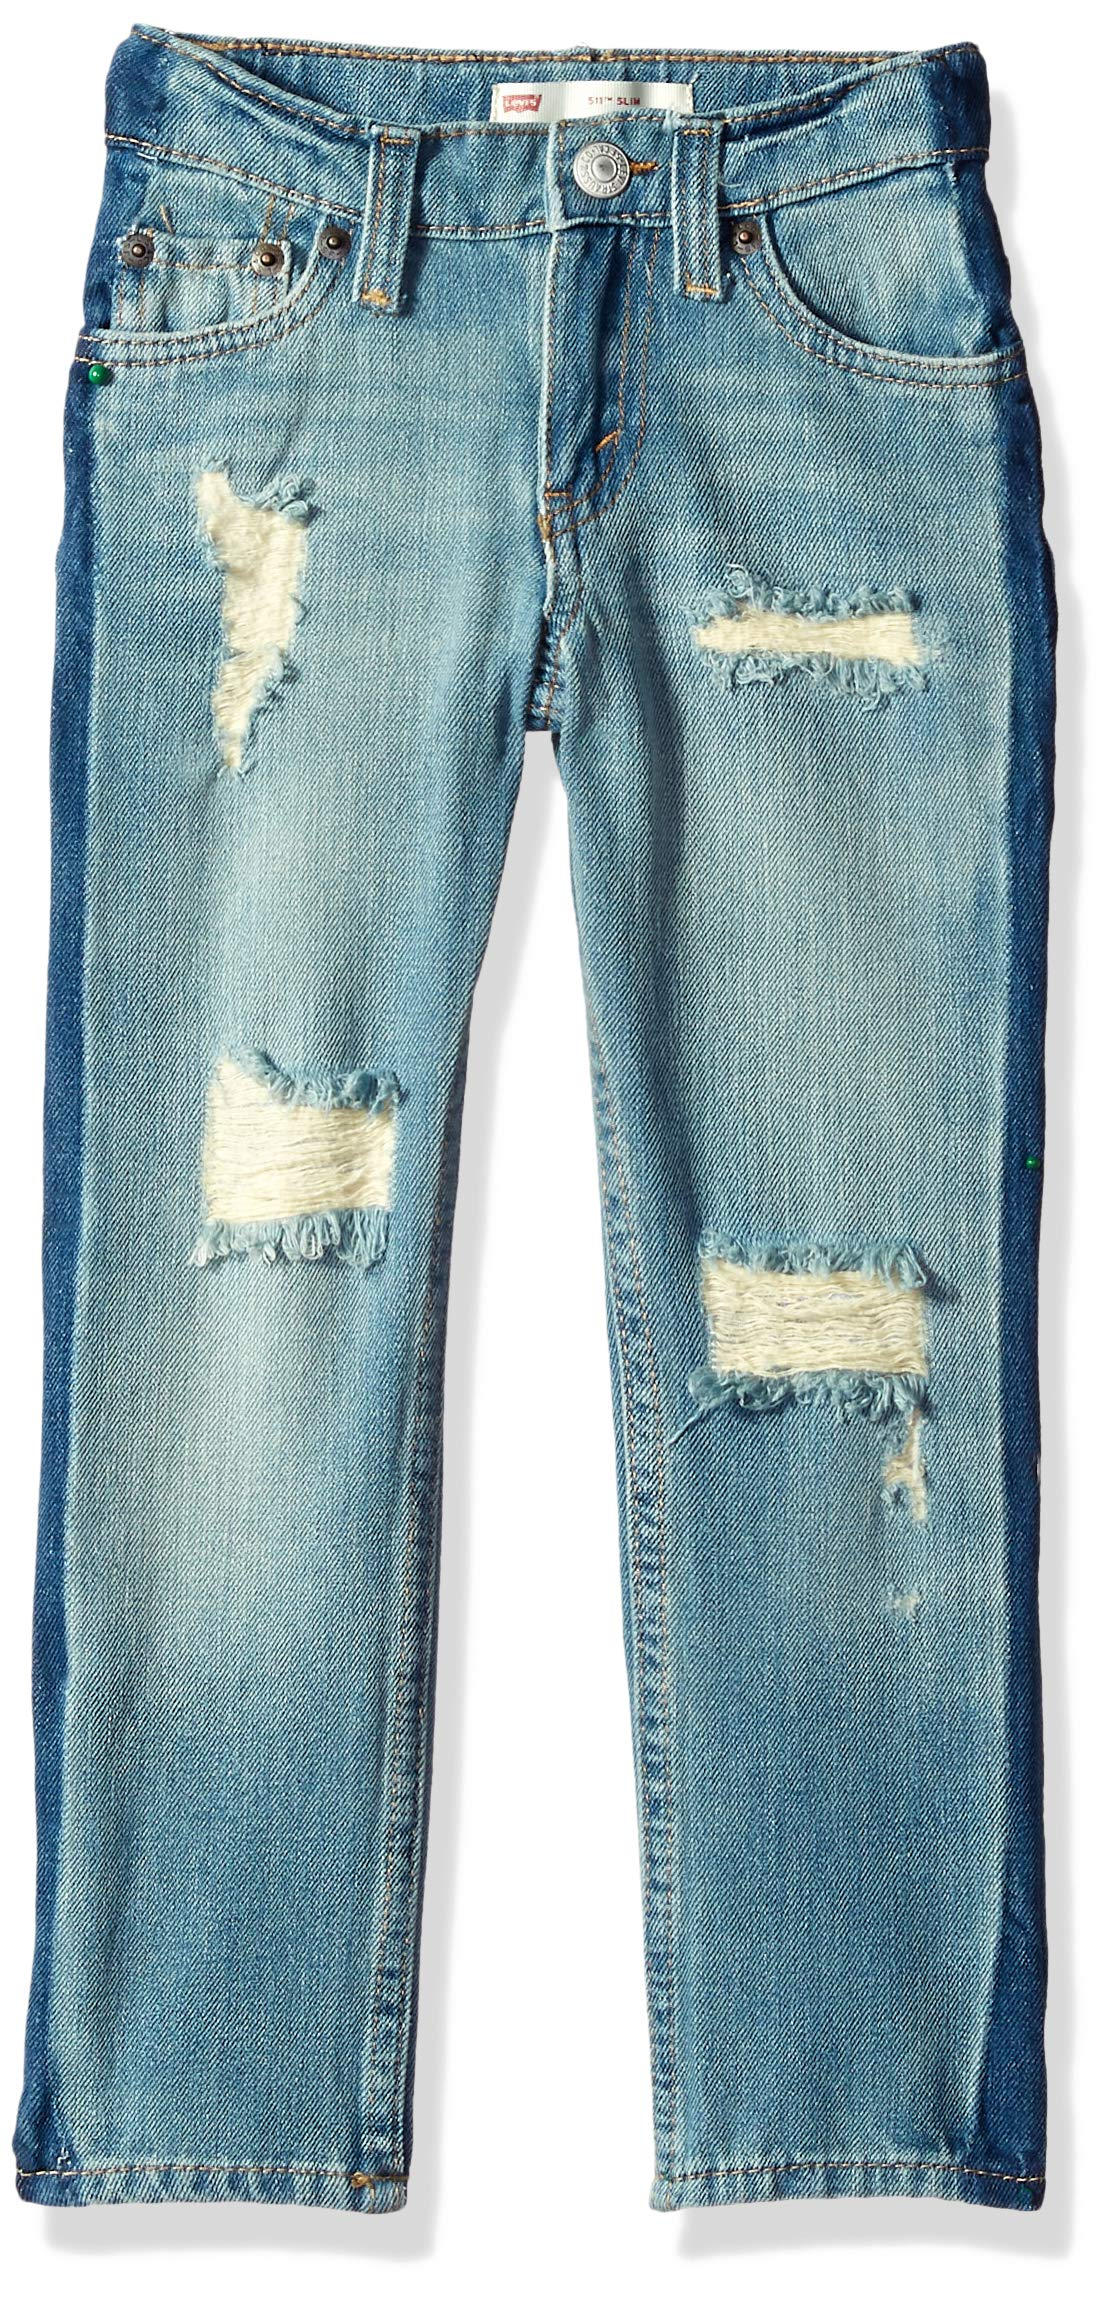 Levi's Boys' Big 511 Slim Fit Performance Jeans, Dallas Stripe, 20 by Levi's (Image #1)